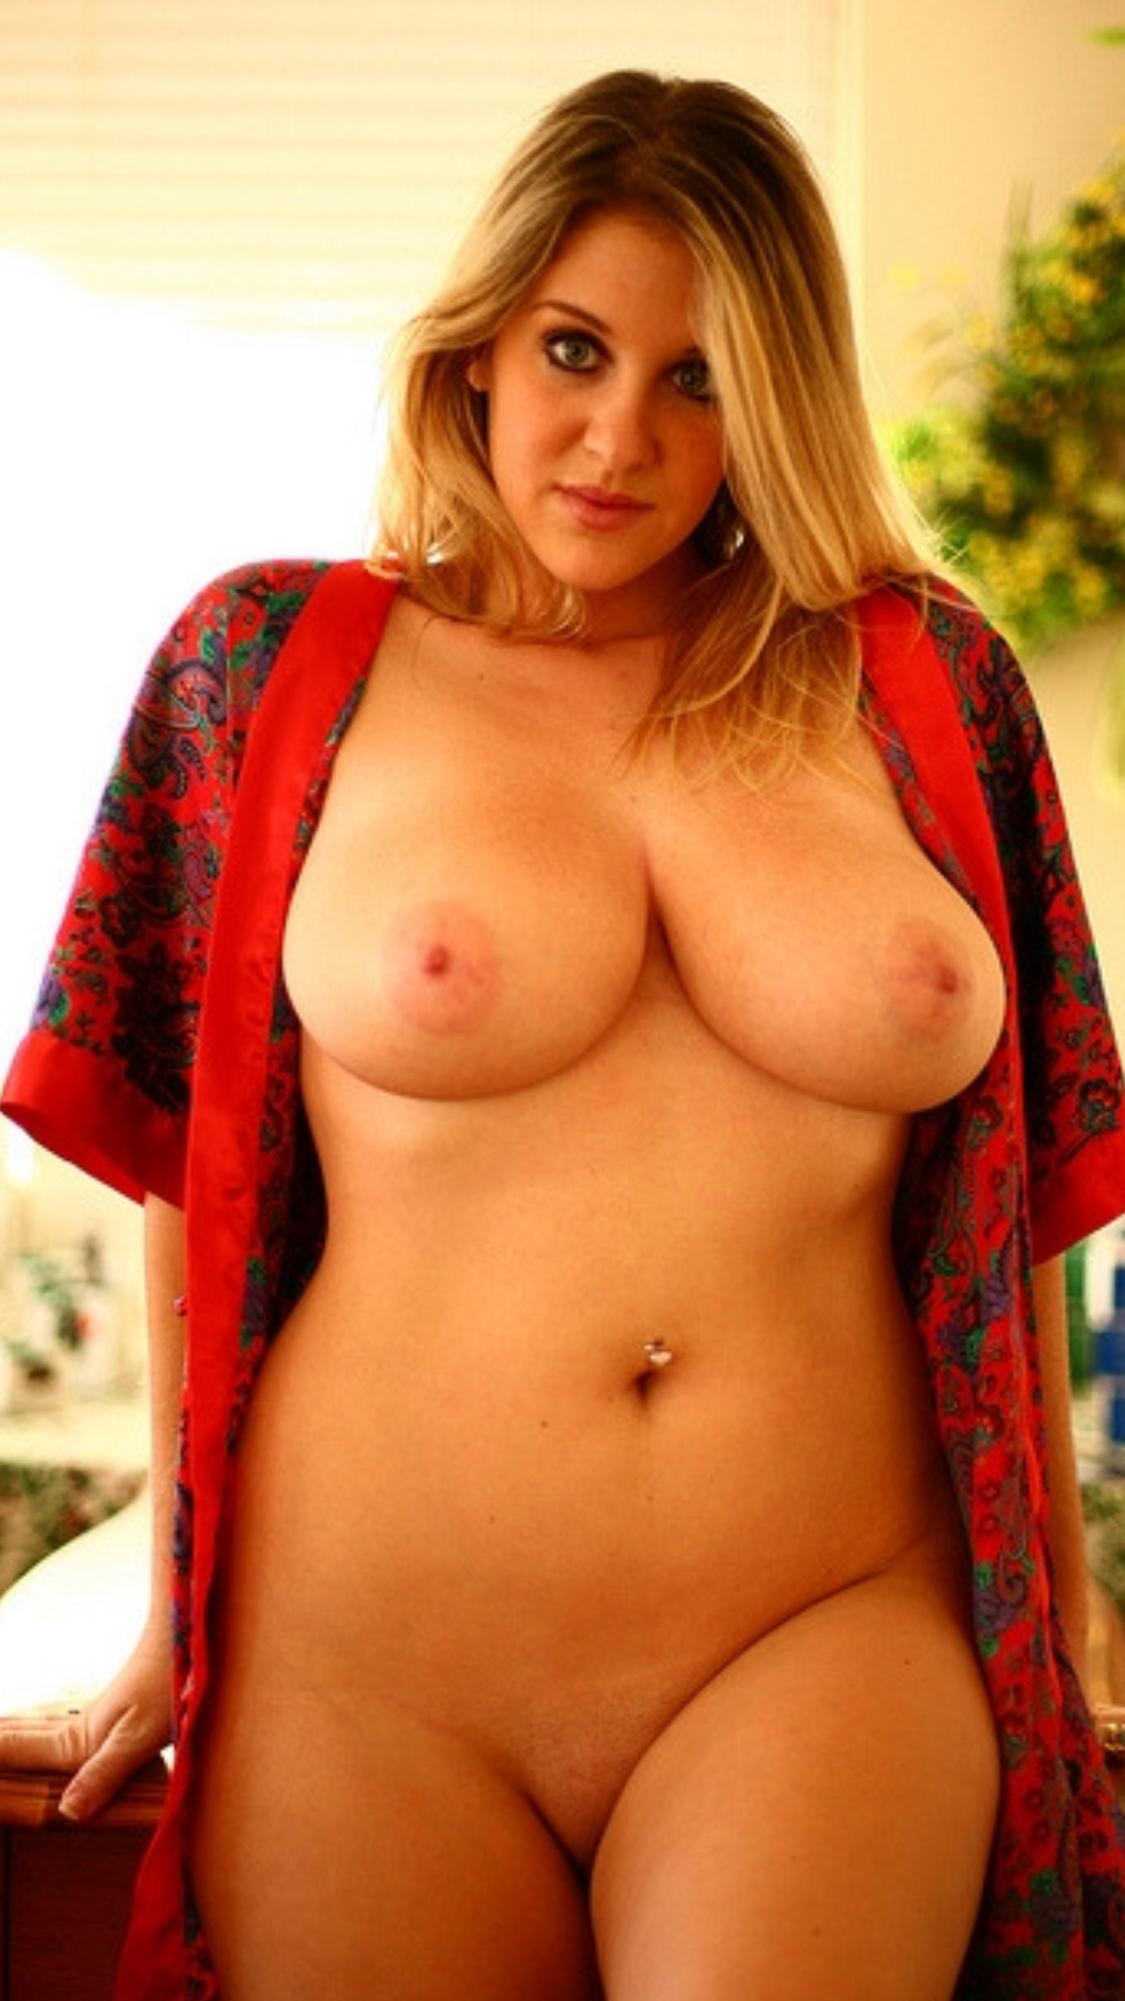 nude girls Sexy lesbian chubby